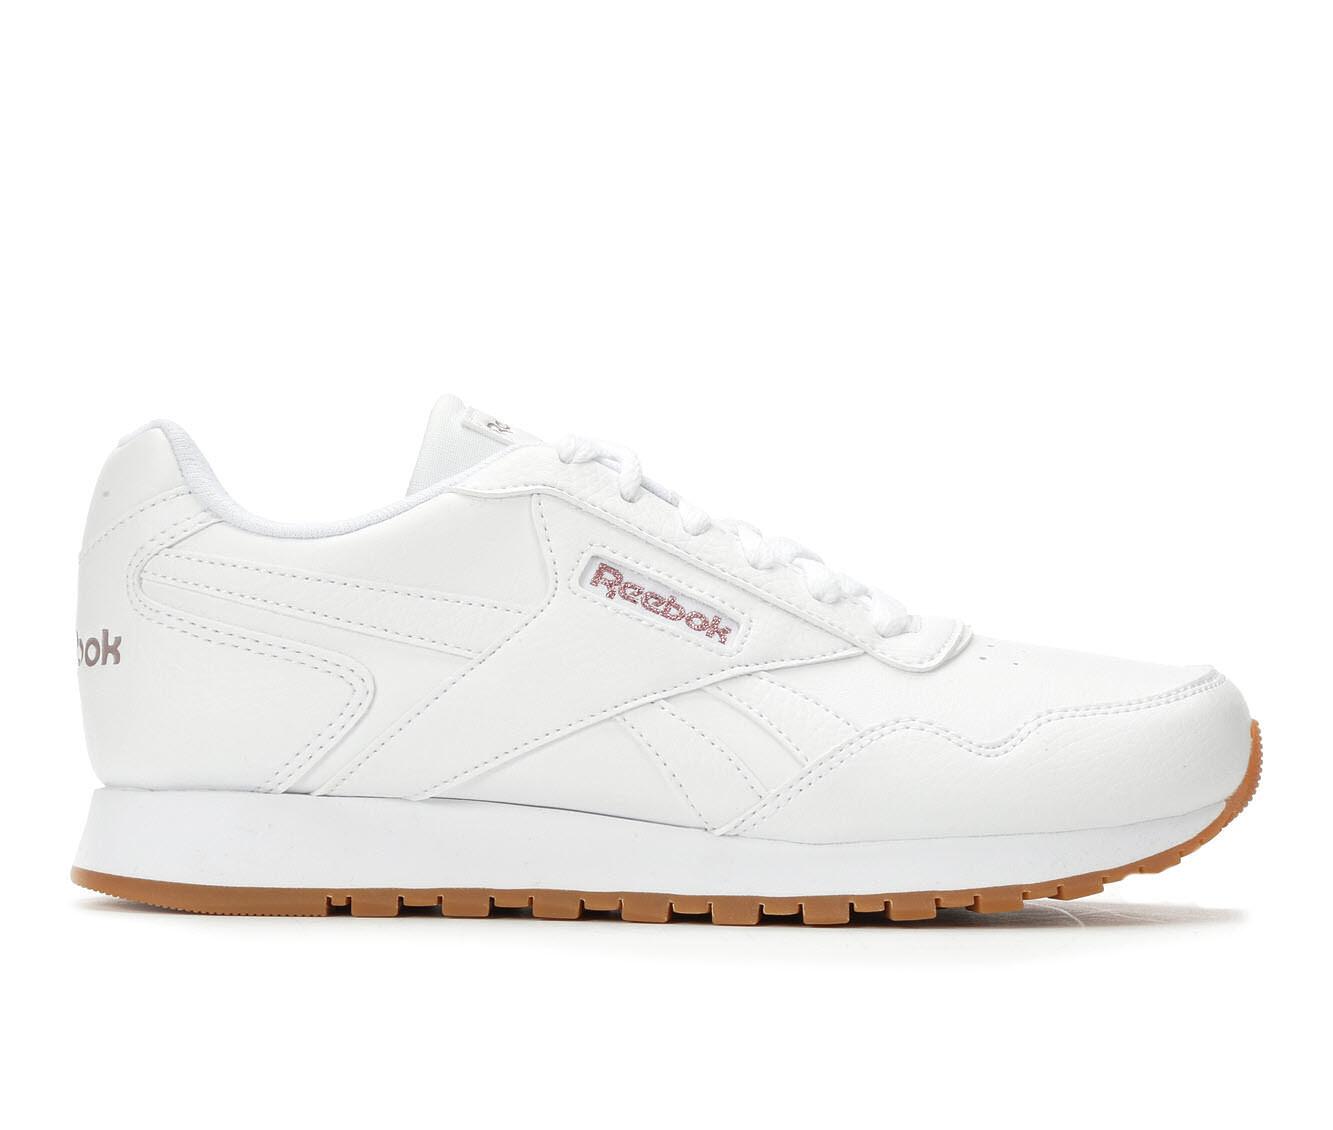 all styles Women's Reebok Classic Harman Run Retro Sneakers White/Rose/Gum